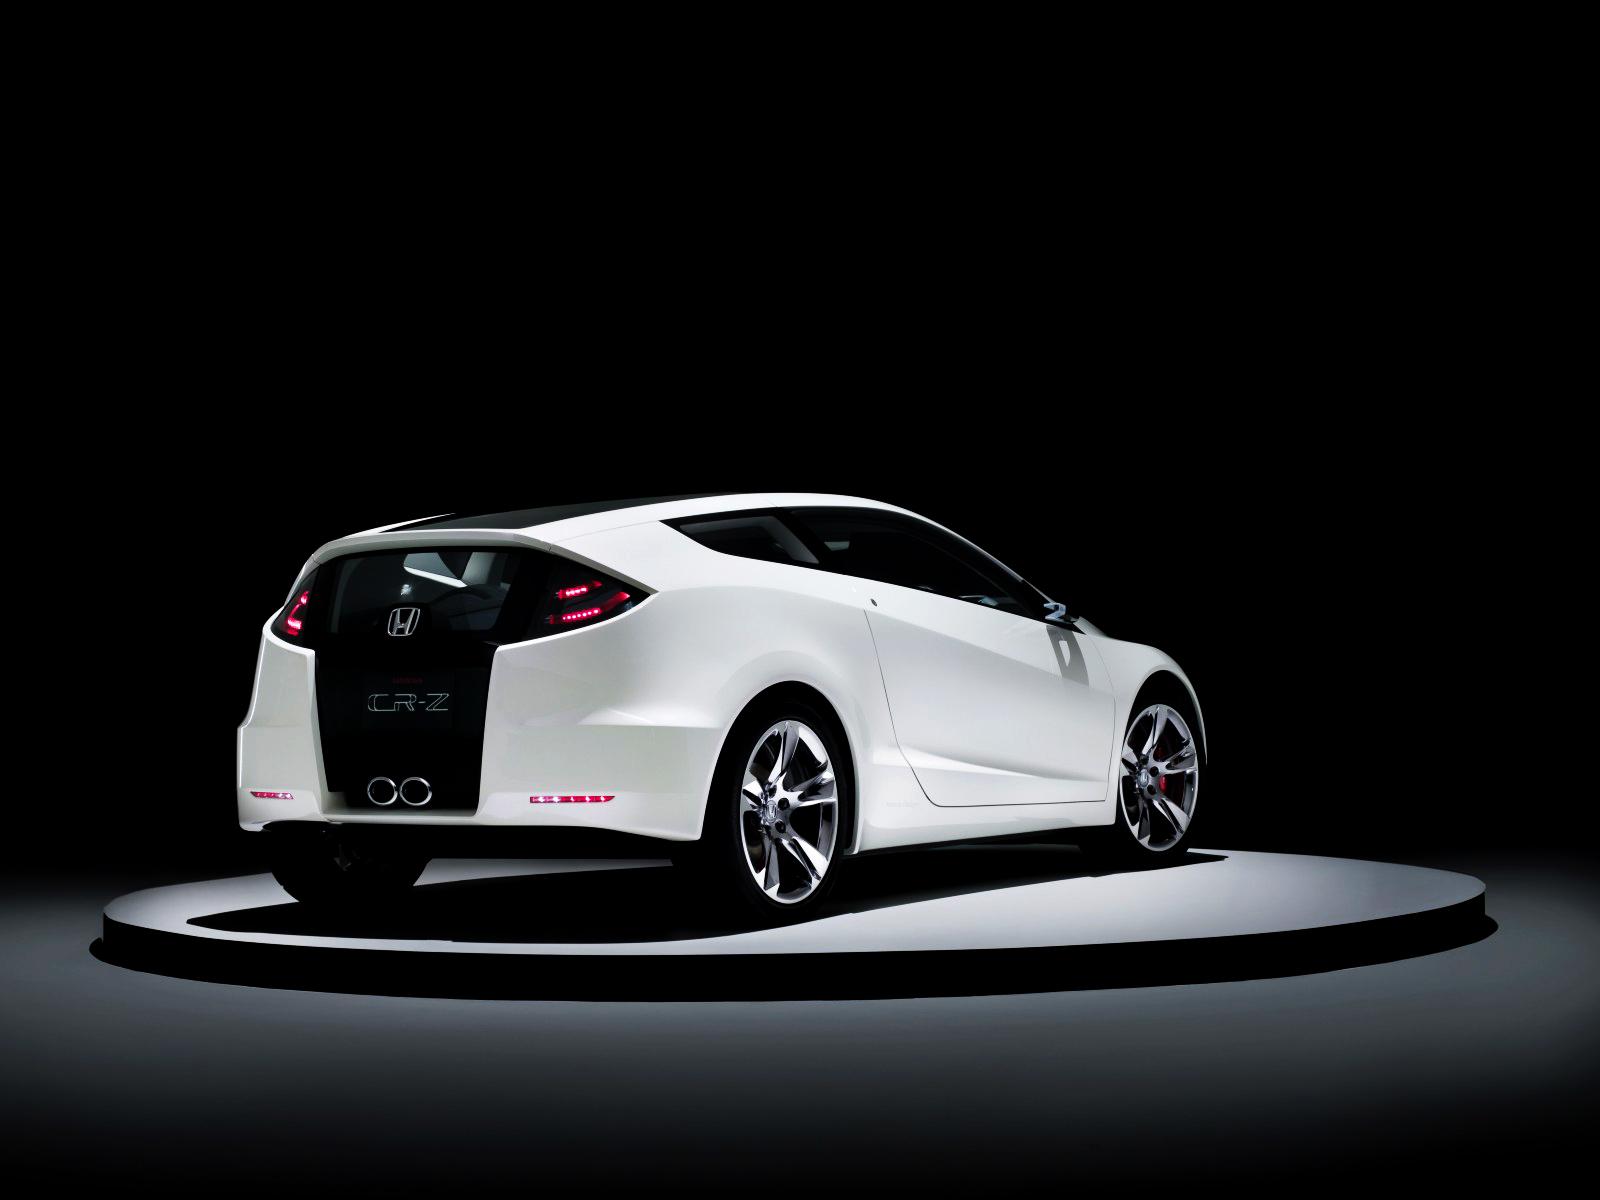 Honda cr z 2012 car hd wallpaper for windows 7 xp - Car wallpaper for windows xp ...